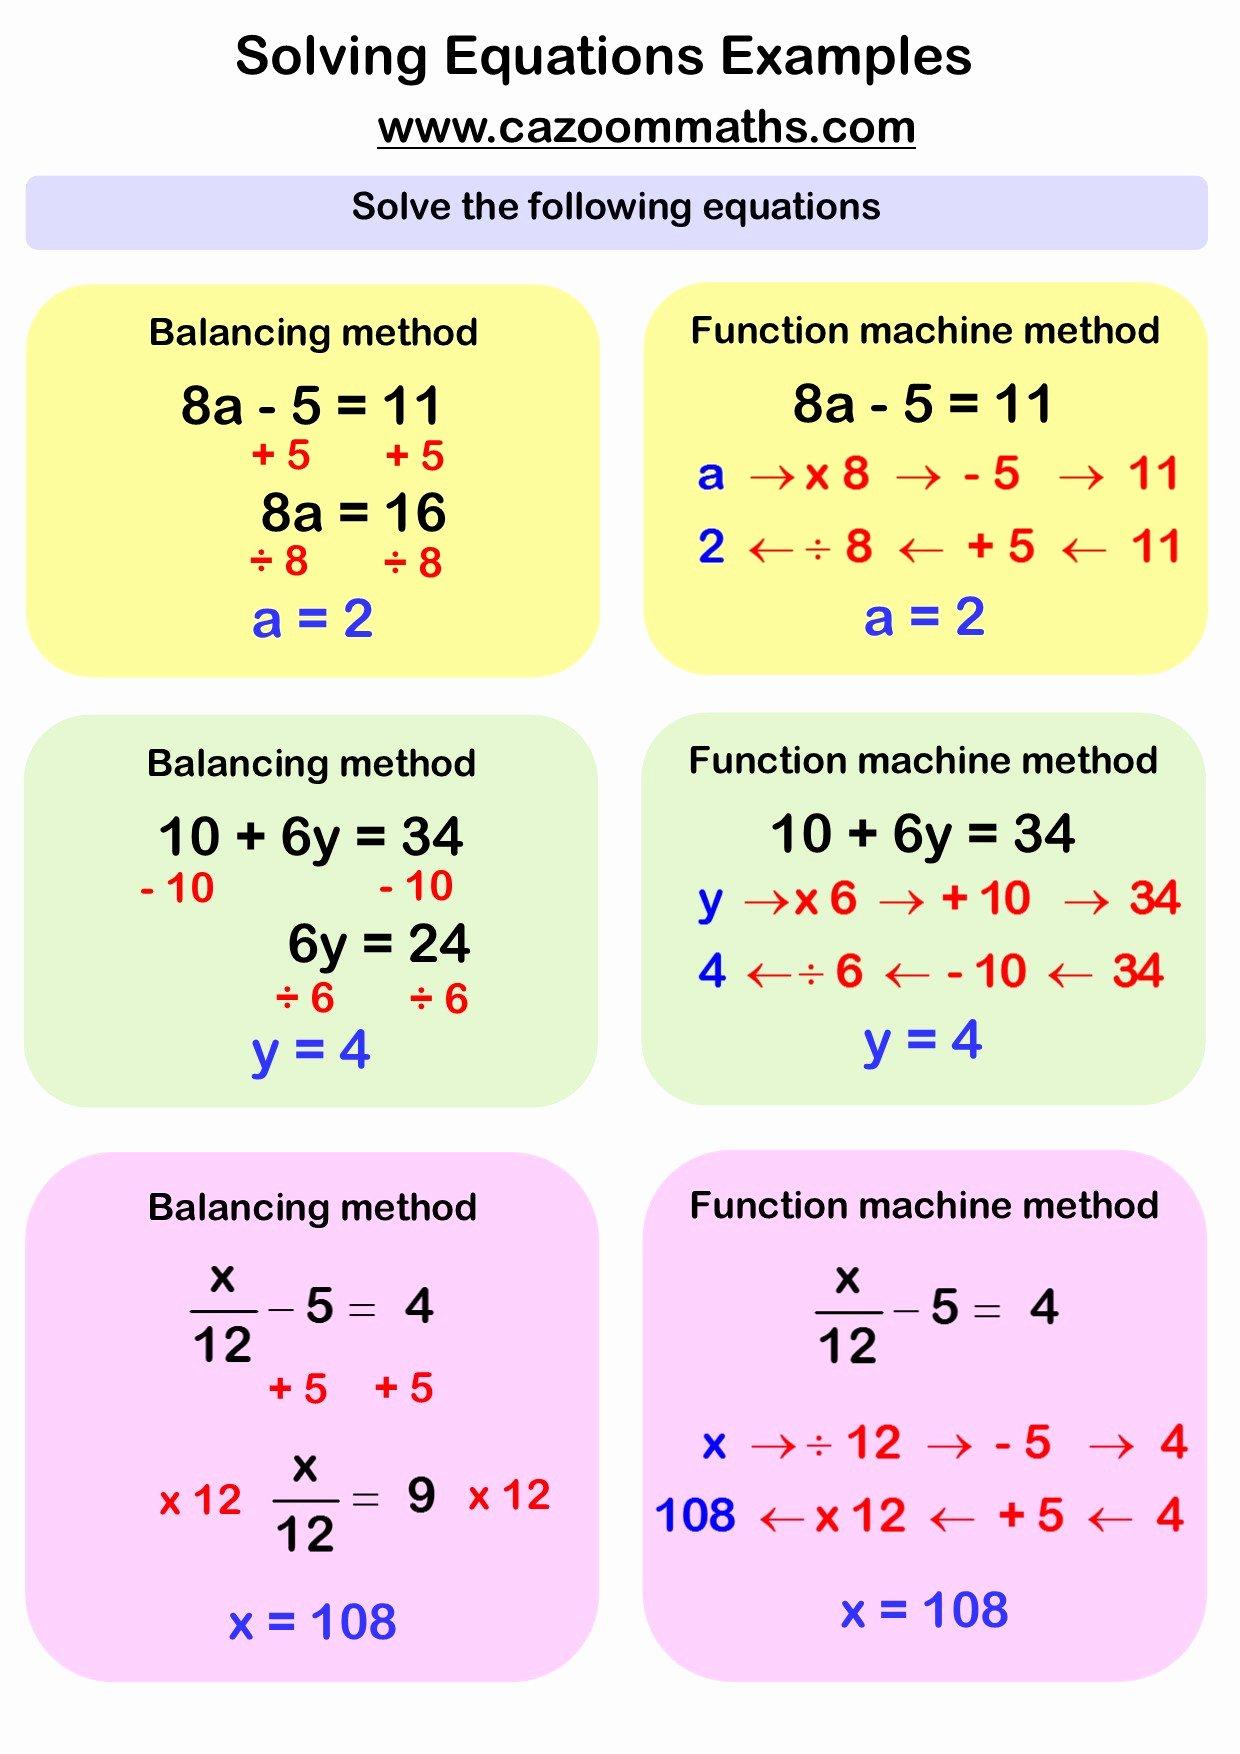 Solving Linear Equations Worksheet Pdf Fresh solving Linear Equations Word Problems Worksheet Pdf